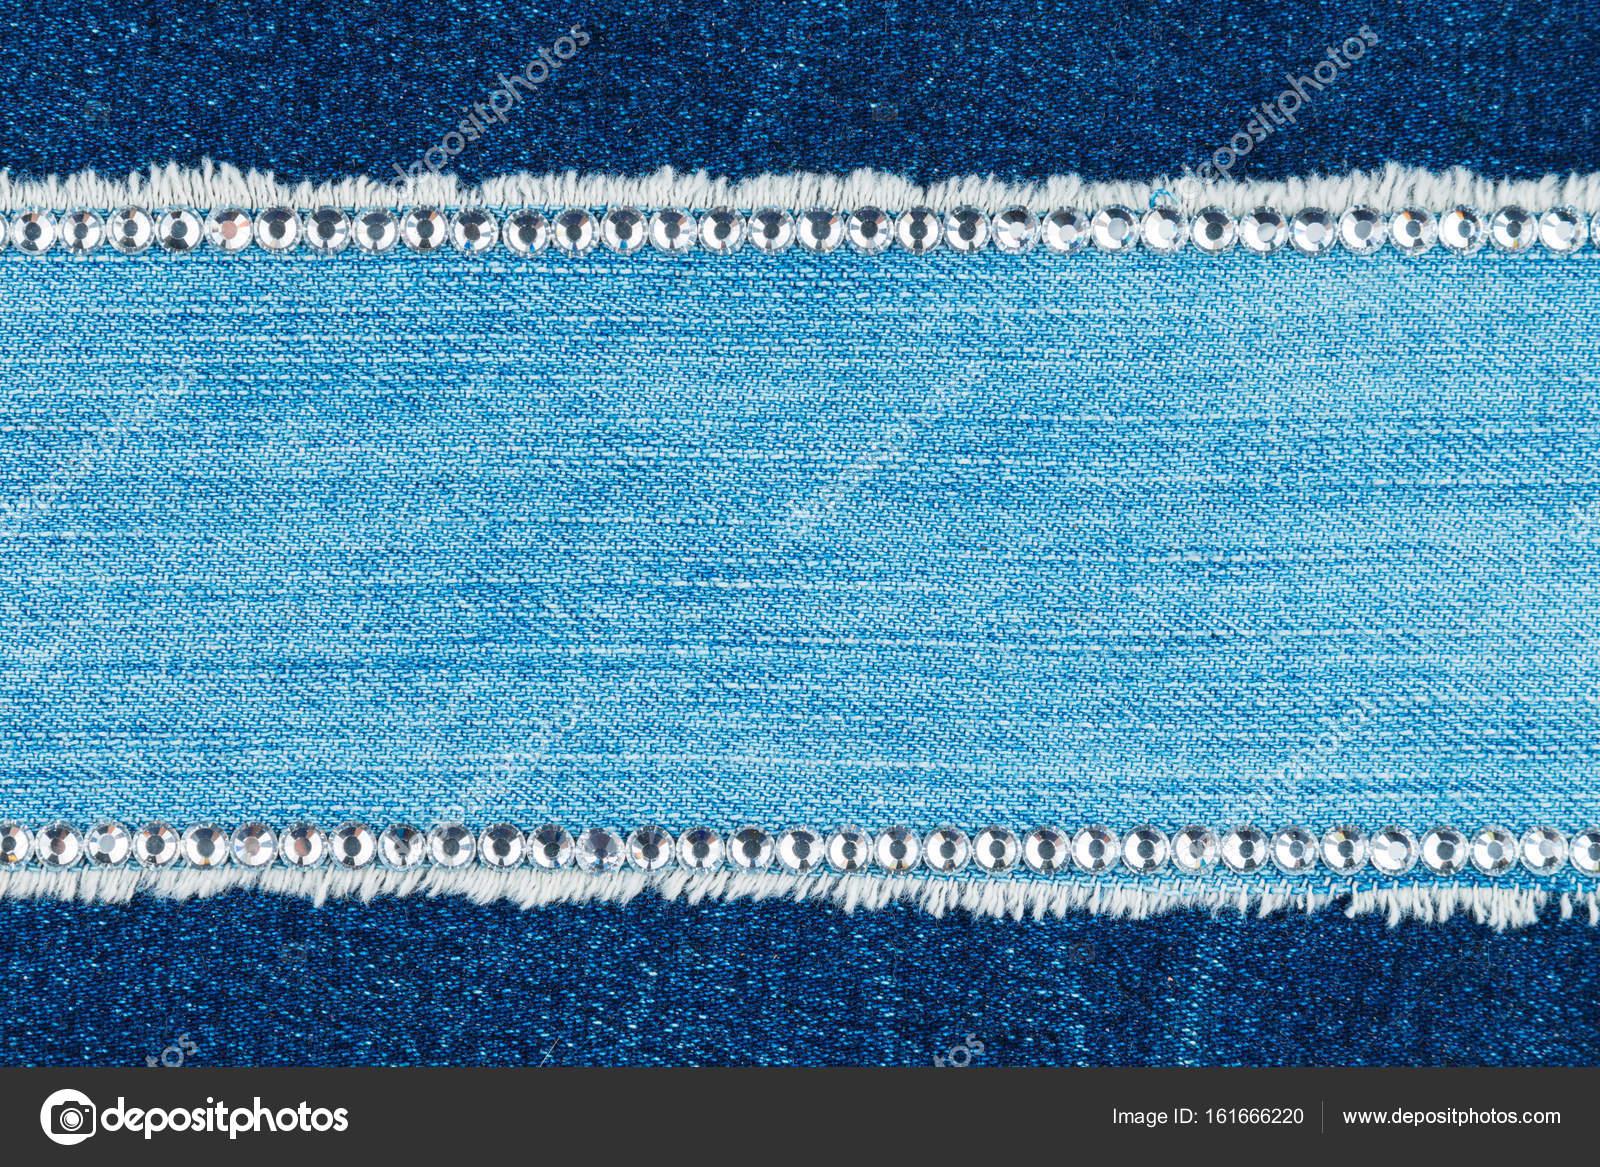 Marco de luz jeans está incrustada con diamantes de imitación, con ...